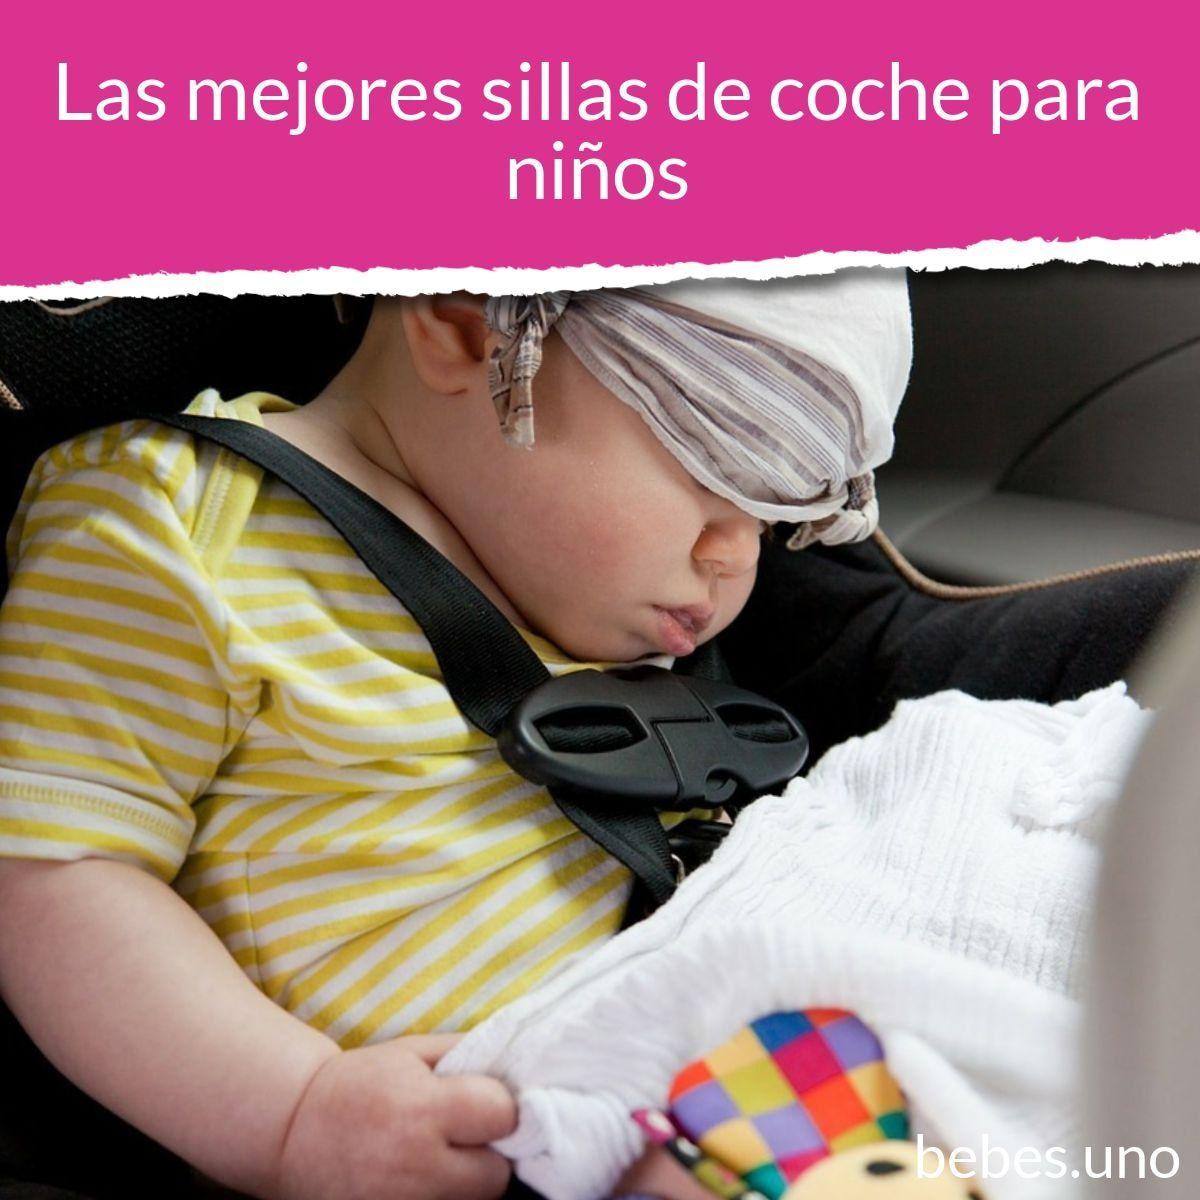 53 Ideas De Sillas De Coche Para Bebes Sillas De Coche Coches Para Bebes Sillas